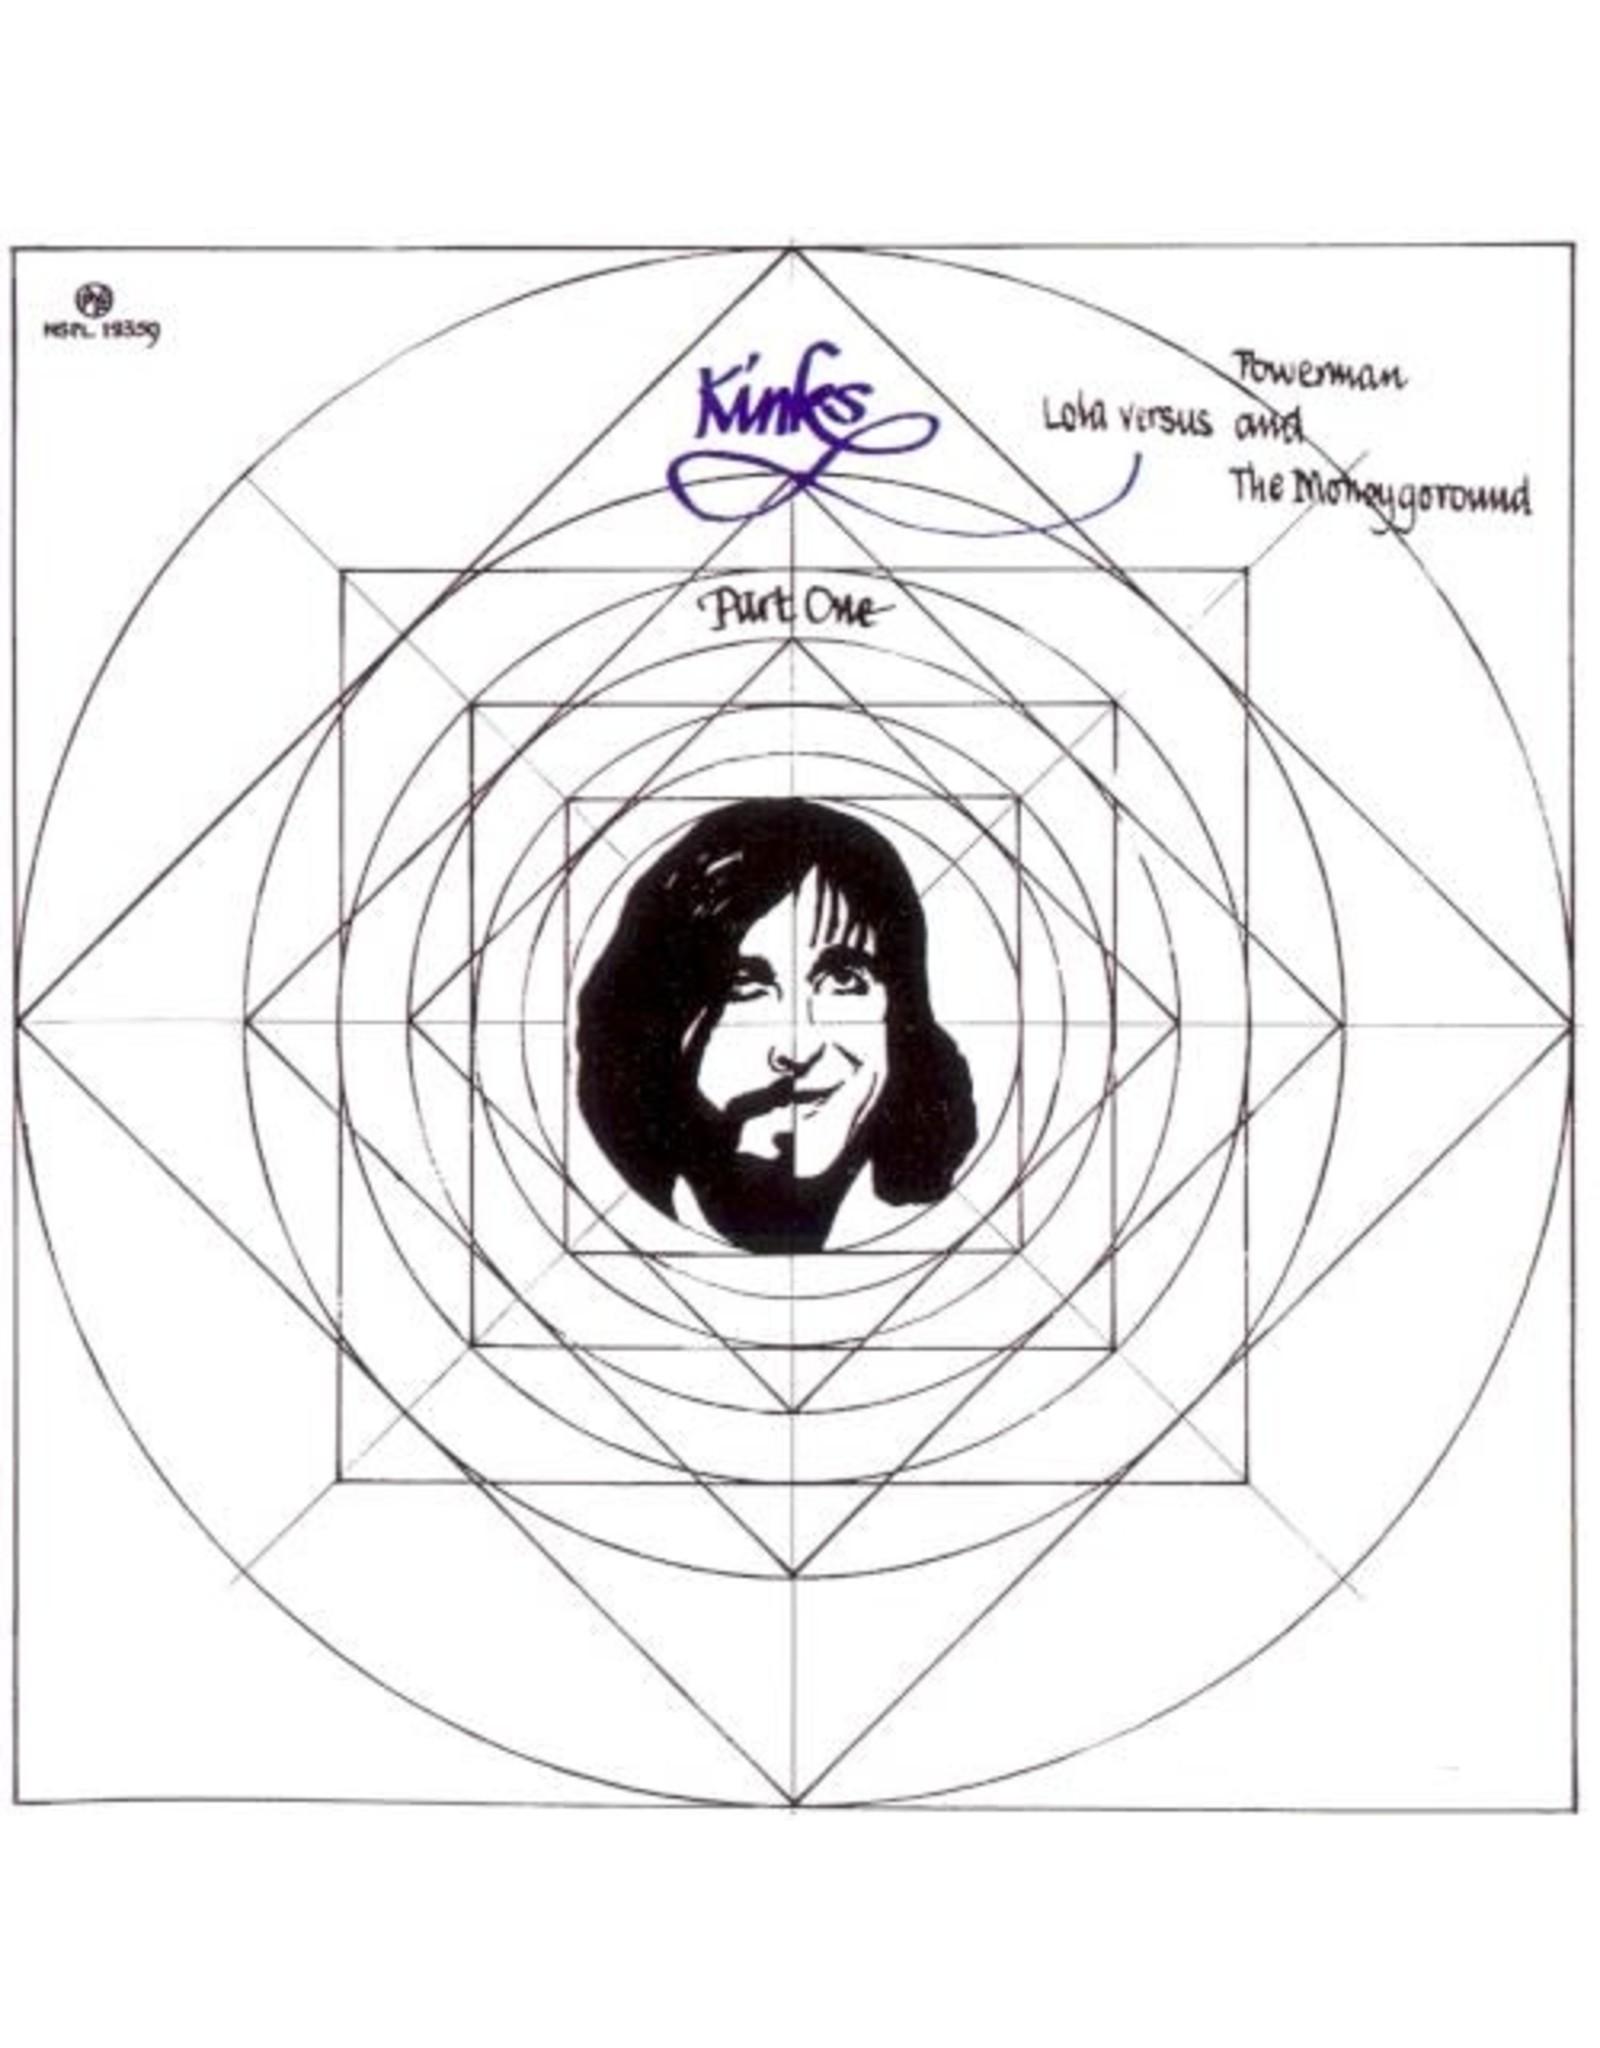 Kinks - Lola Vs The Powerman CD LP Dlx Box